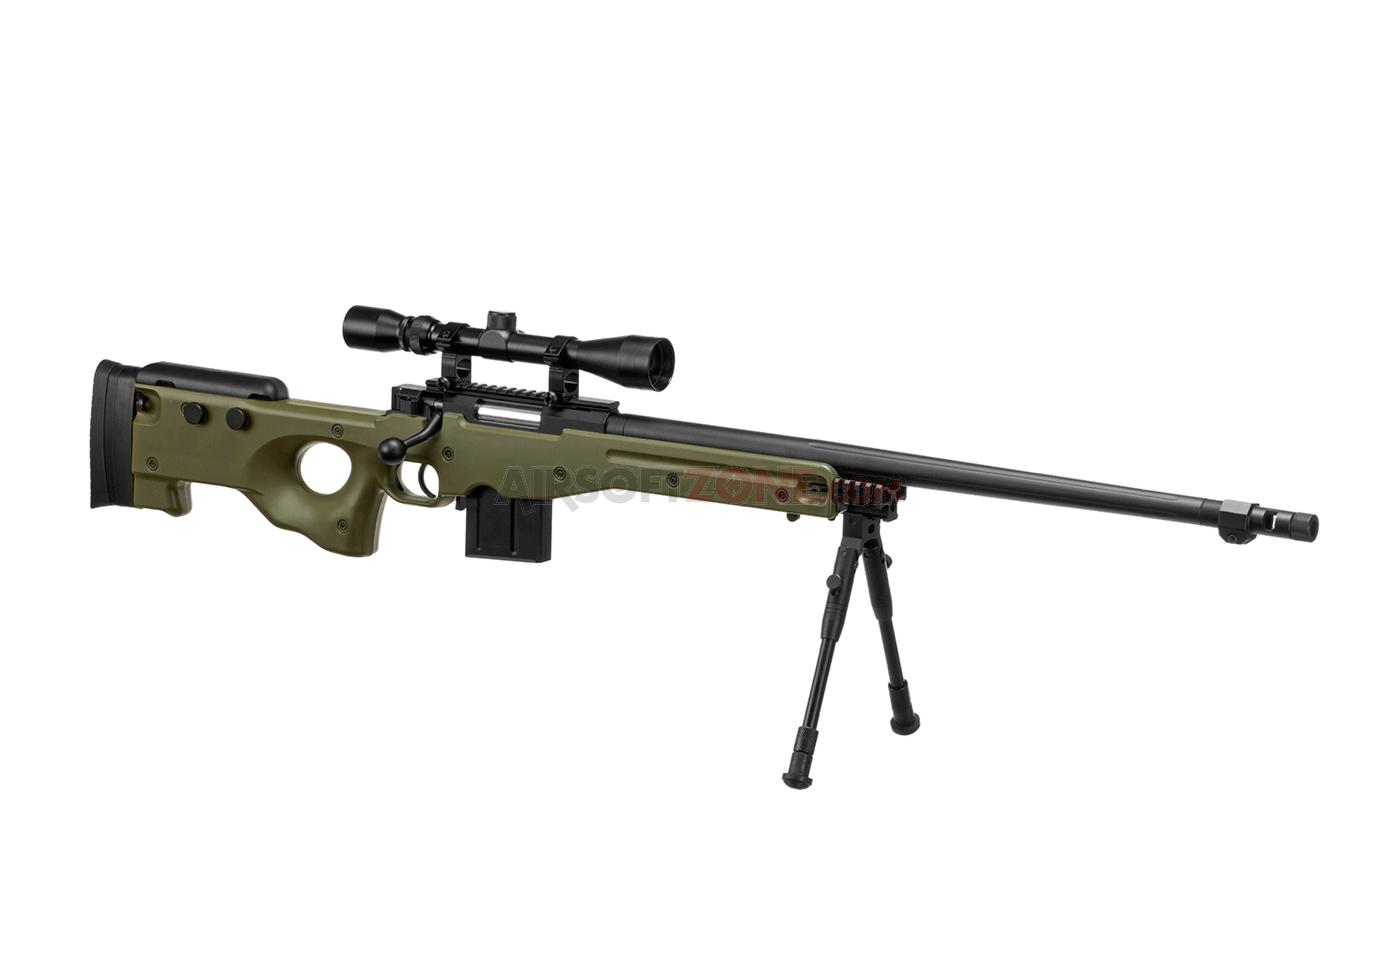 L96 AWP FH Sniper Rifle Set Up...